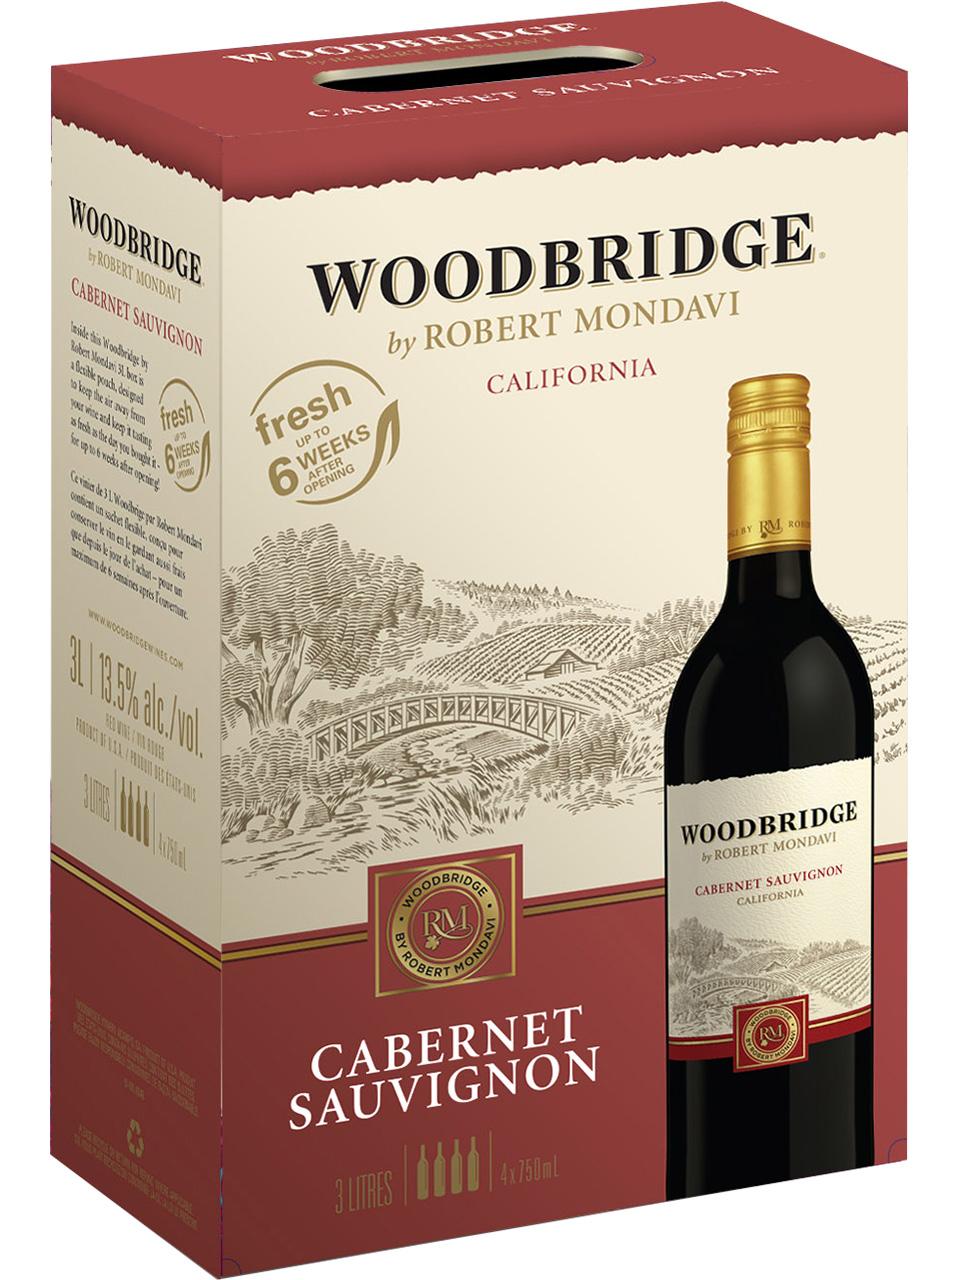 Woodbridge Robert Mondavi Cabernet Sauvignon